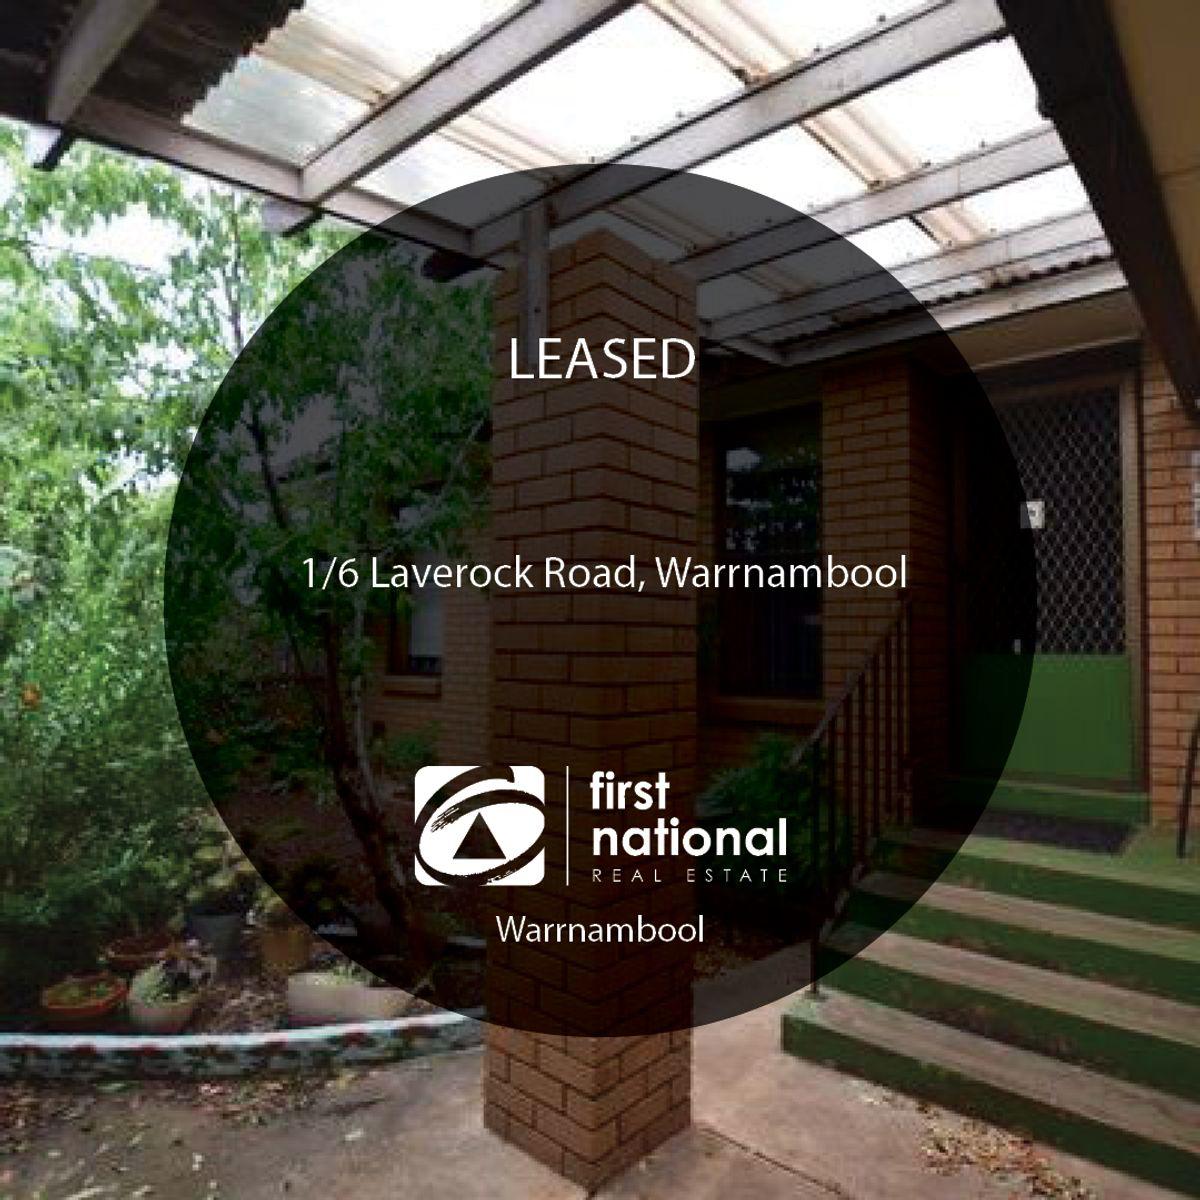 1/6 Laverock Road, Warrnambool, VIC 3280